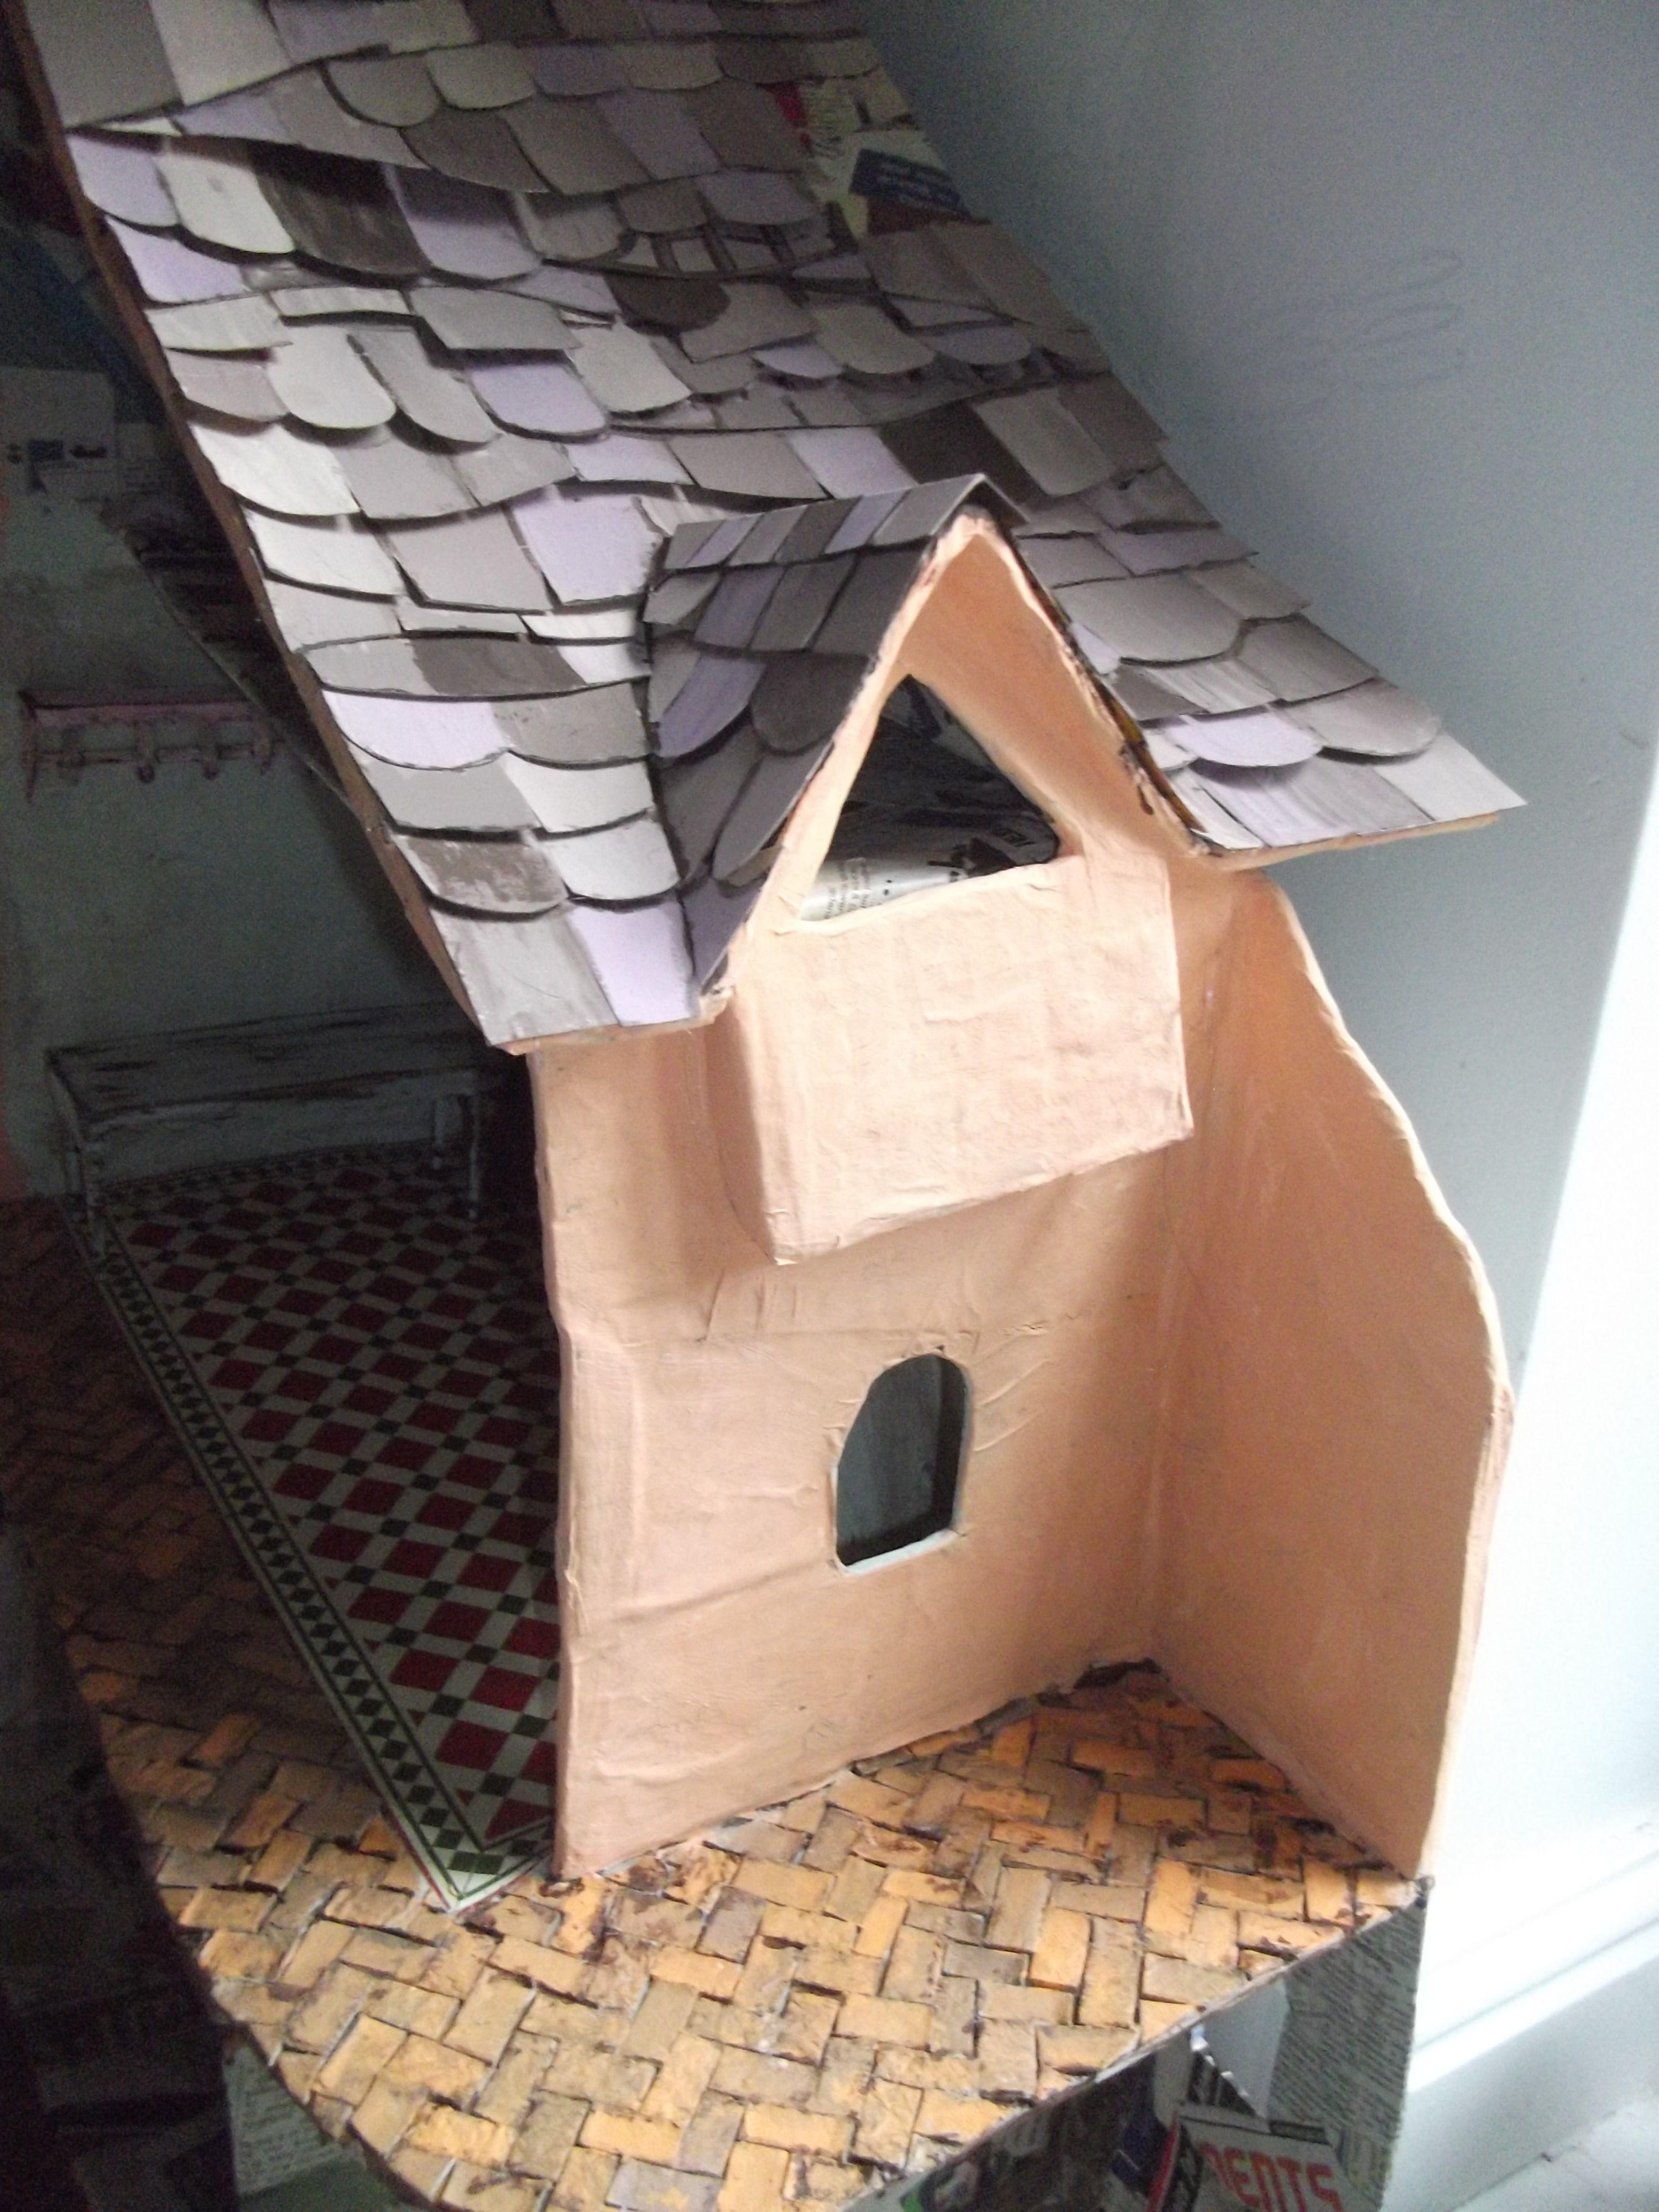 Amazing Effects With Paint And Cardboard For A Diy Dolls House Doll Diy Crafts Diy Dollhouse Diy Doll